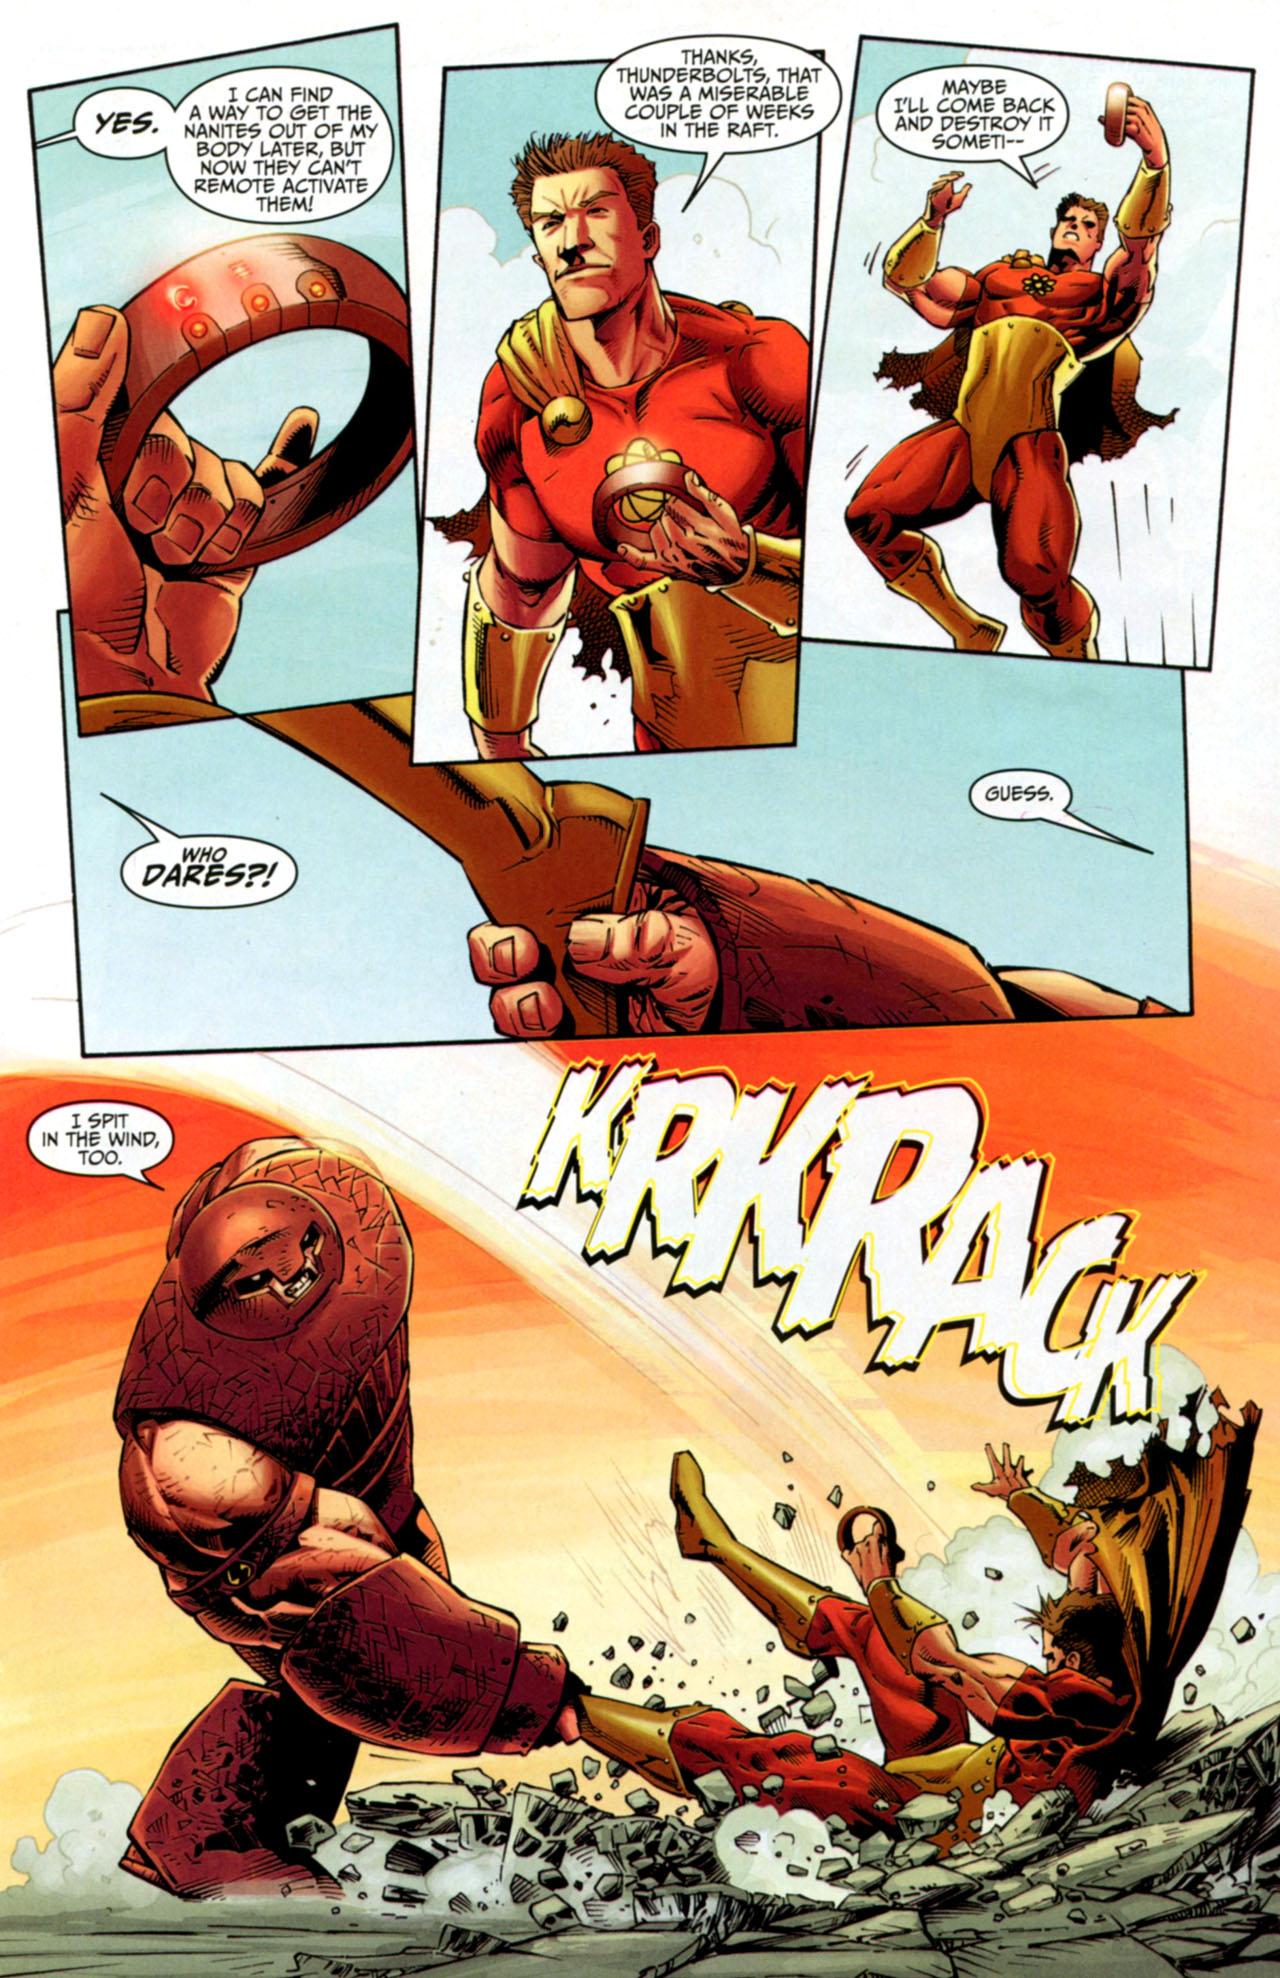 Hyperion Vs Juggernaut